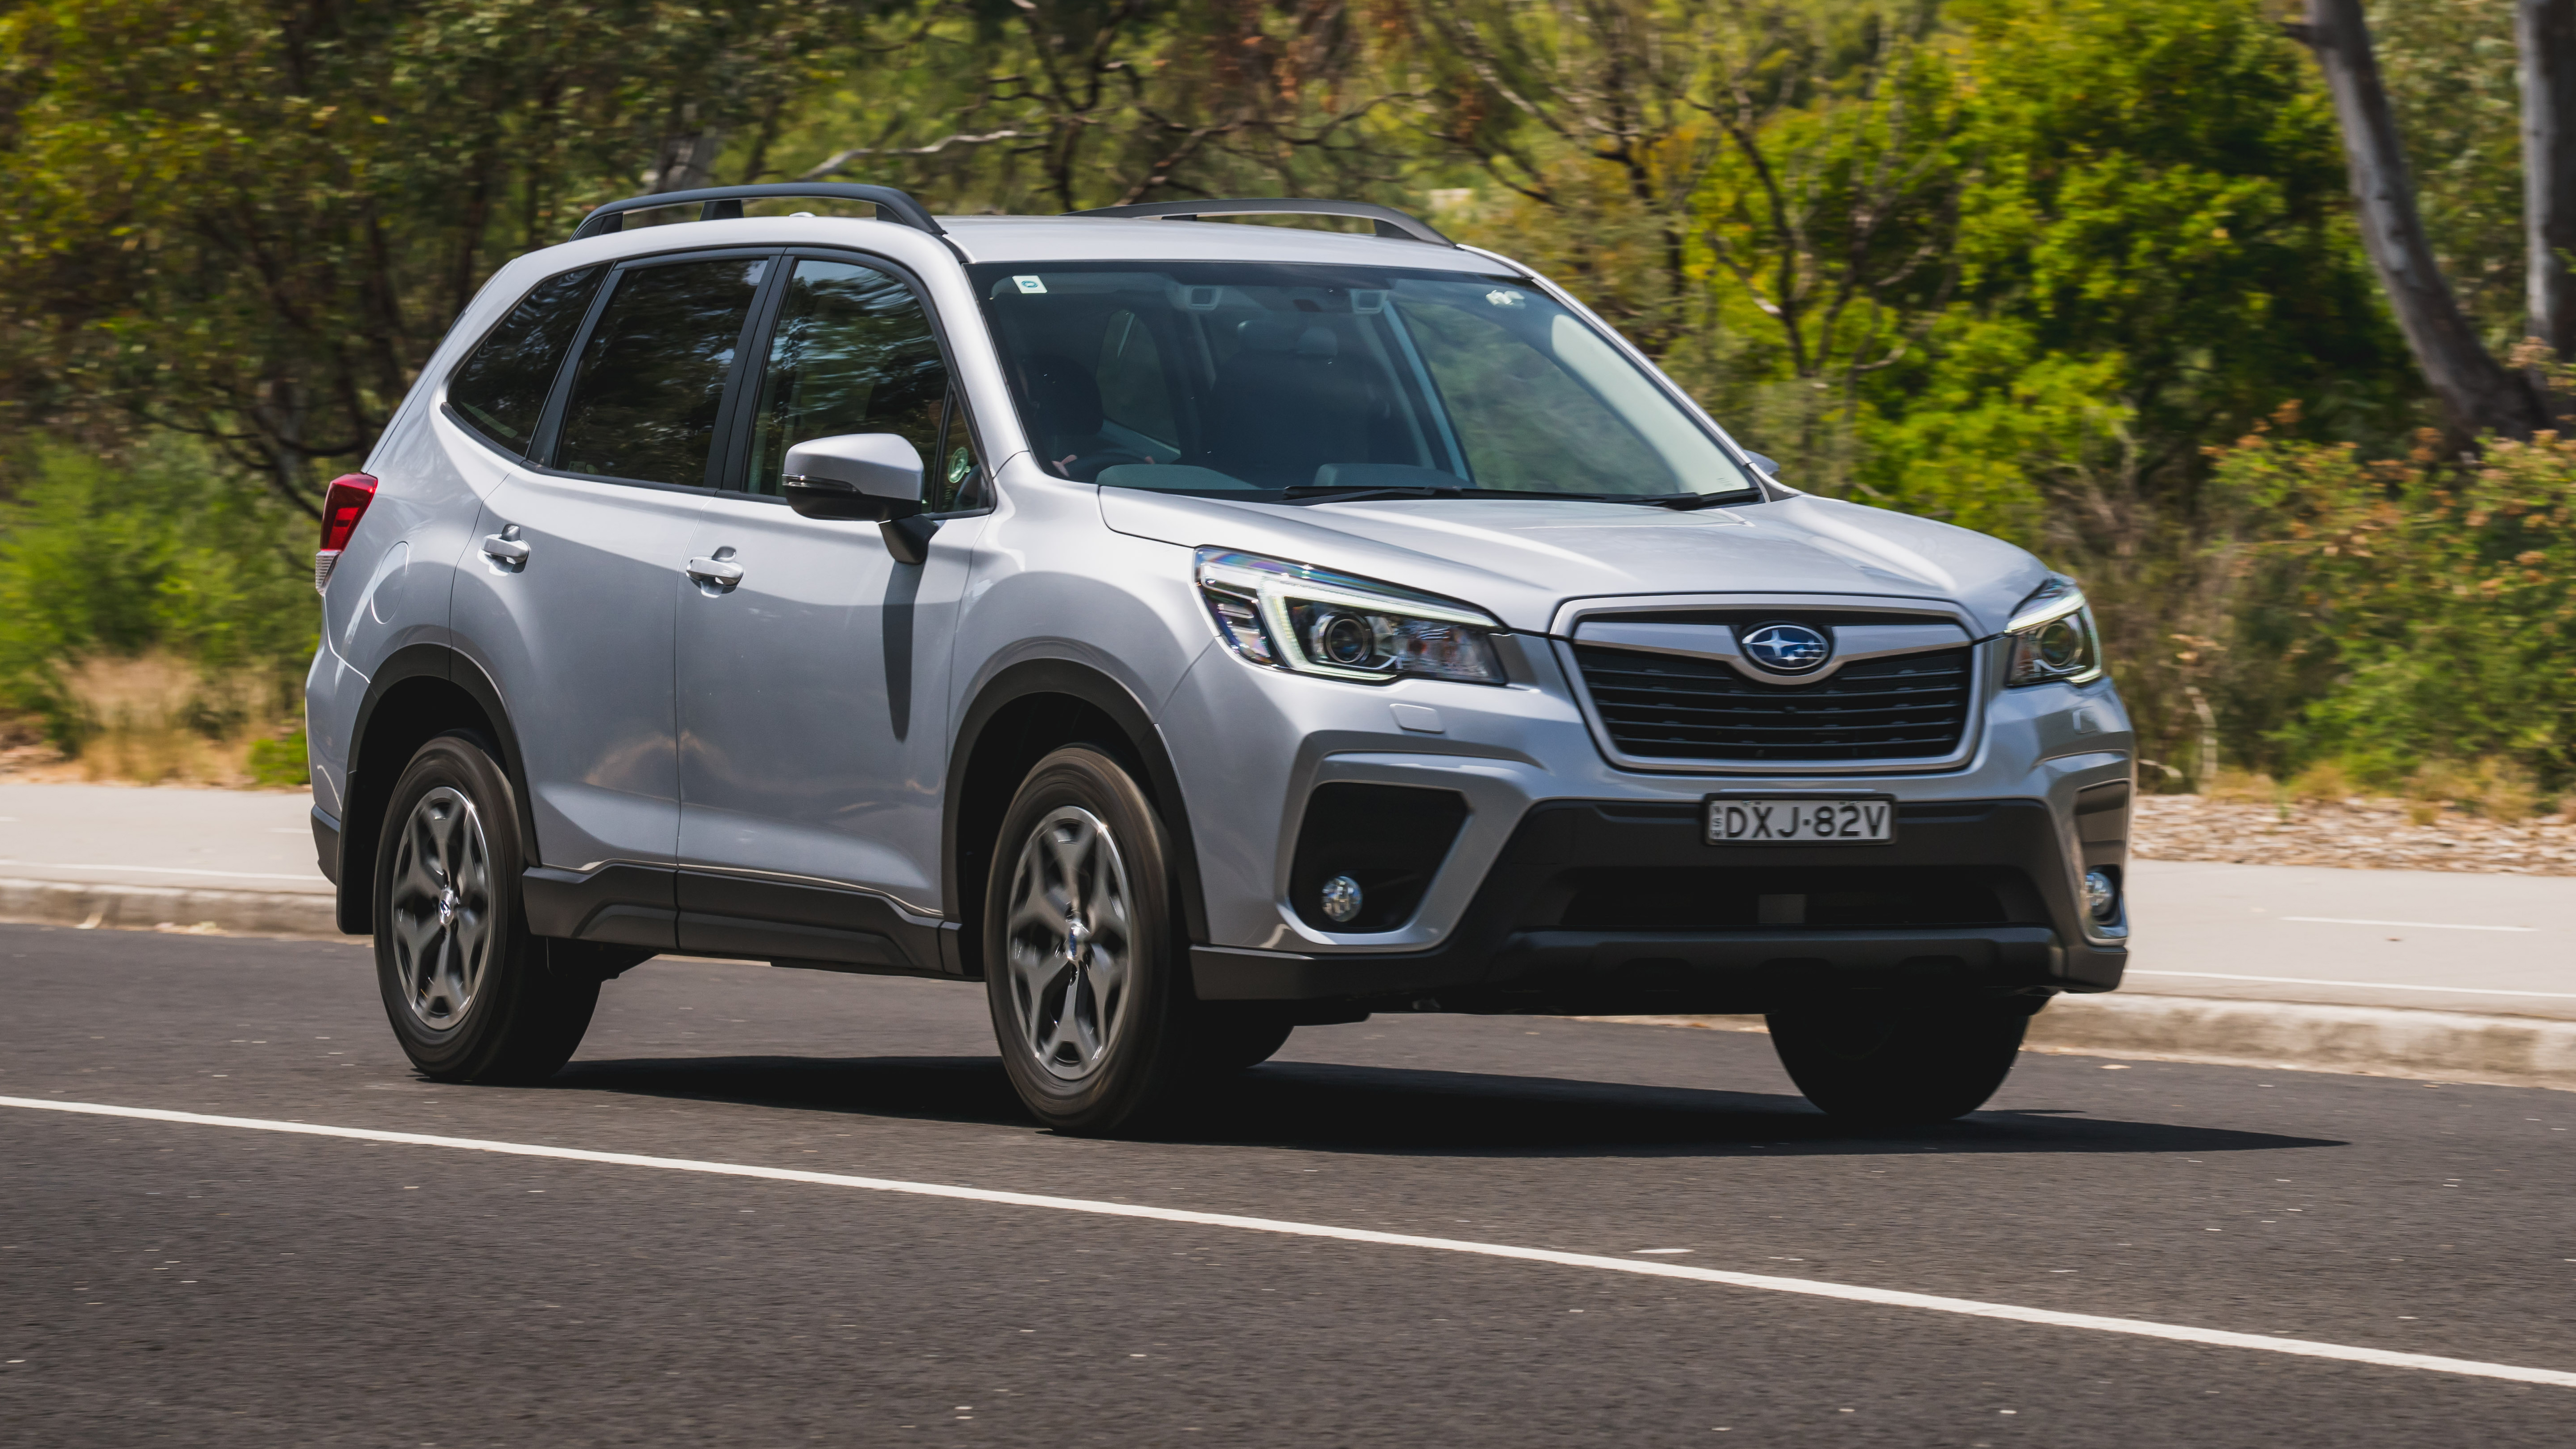 2019 Subaru Forester 2 5i-L review | CarAdvice